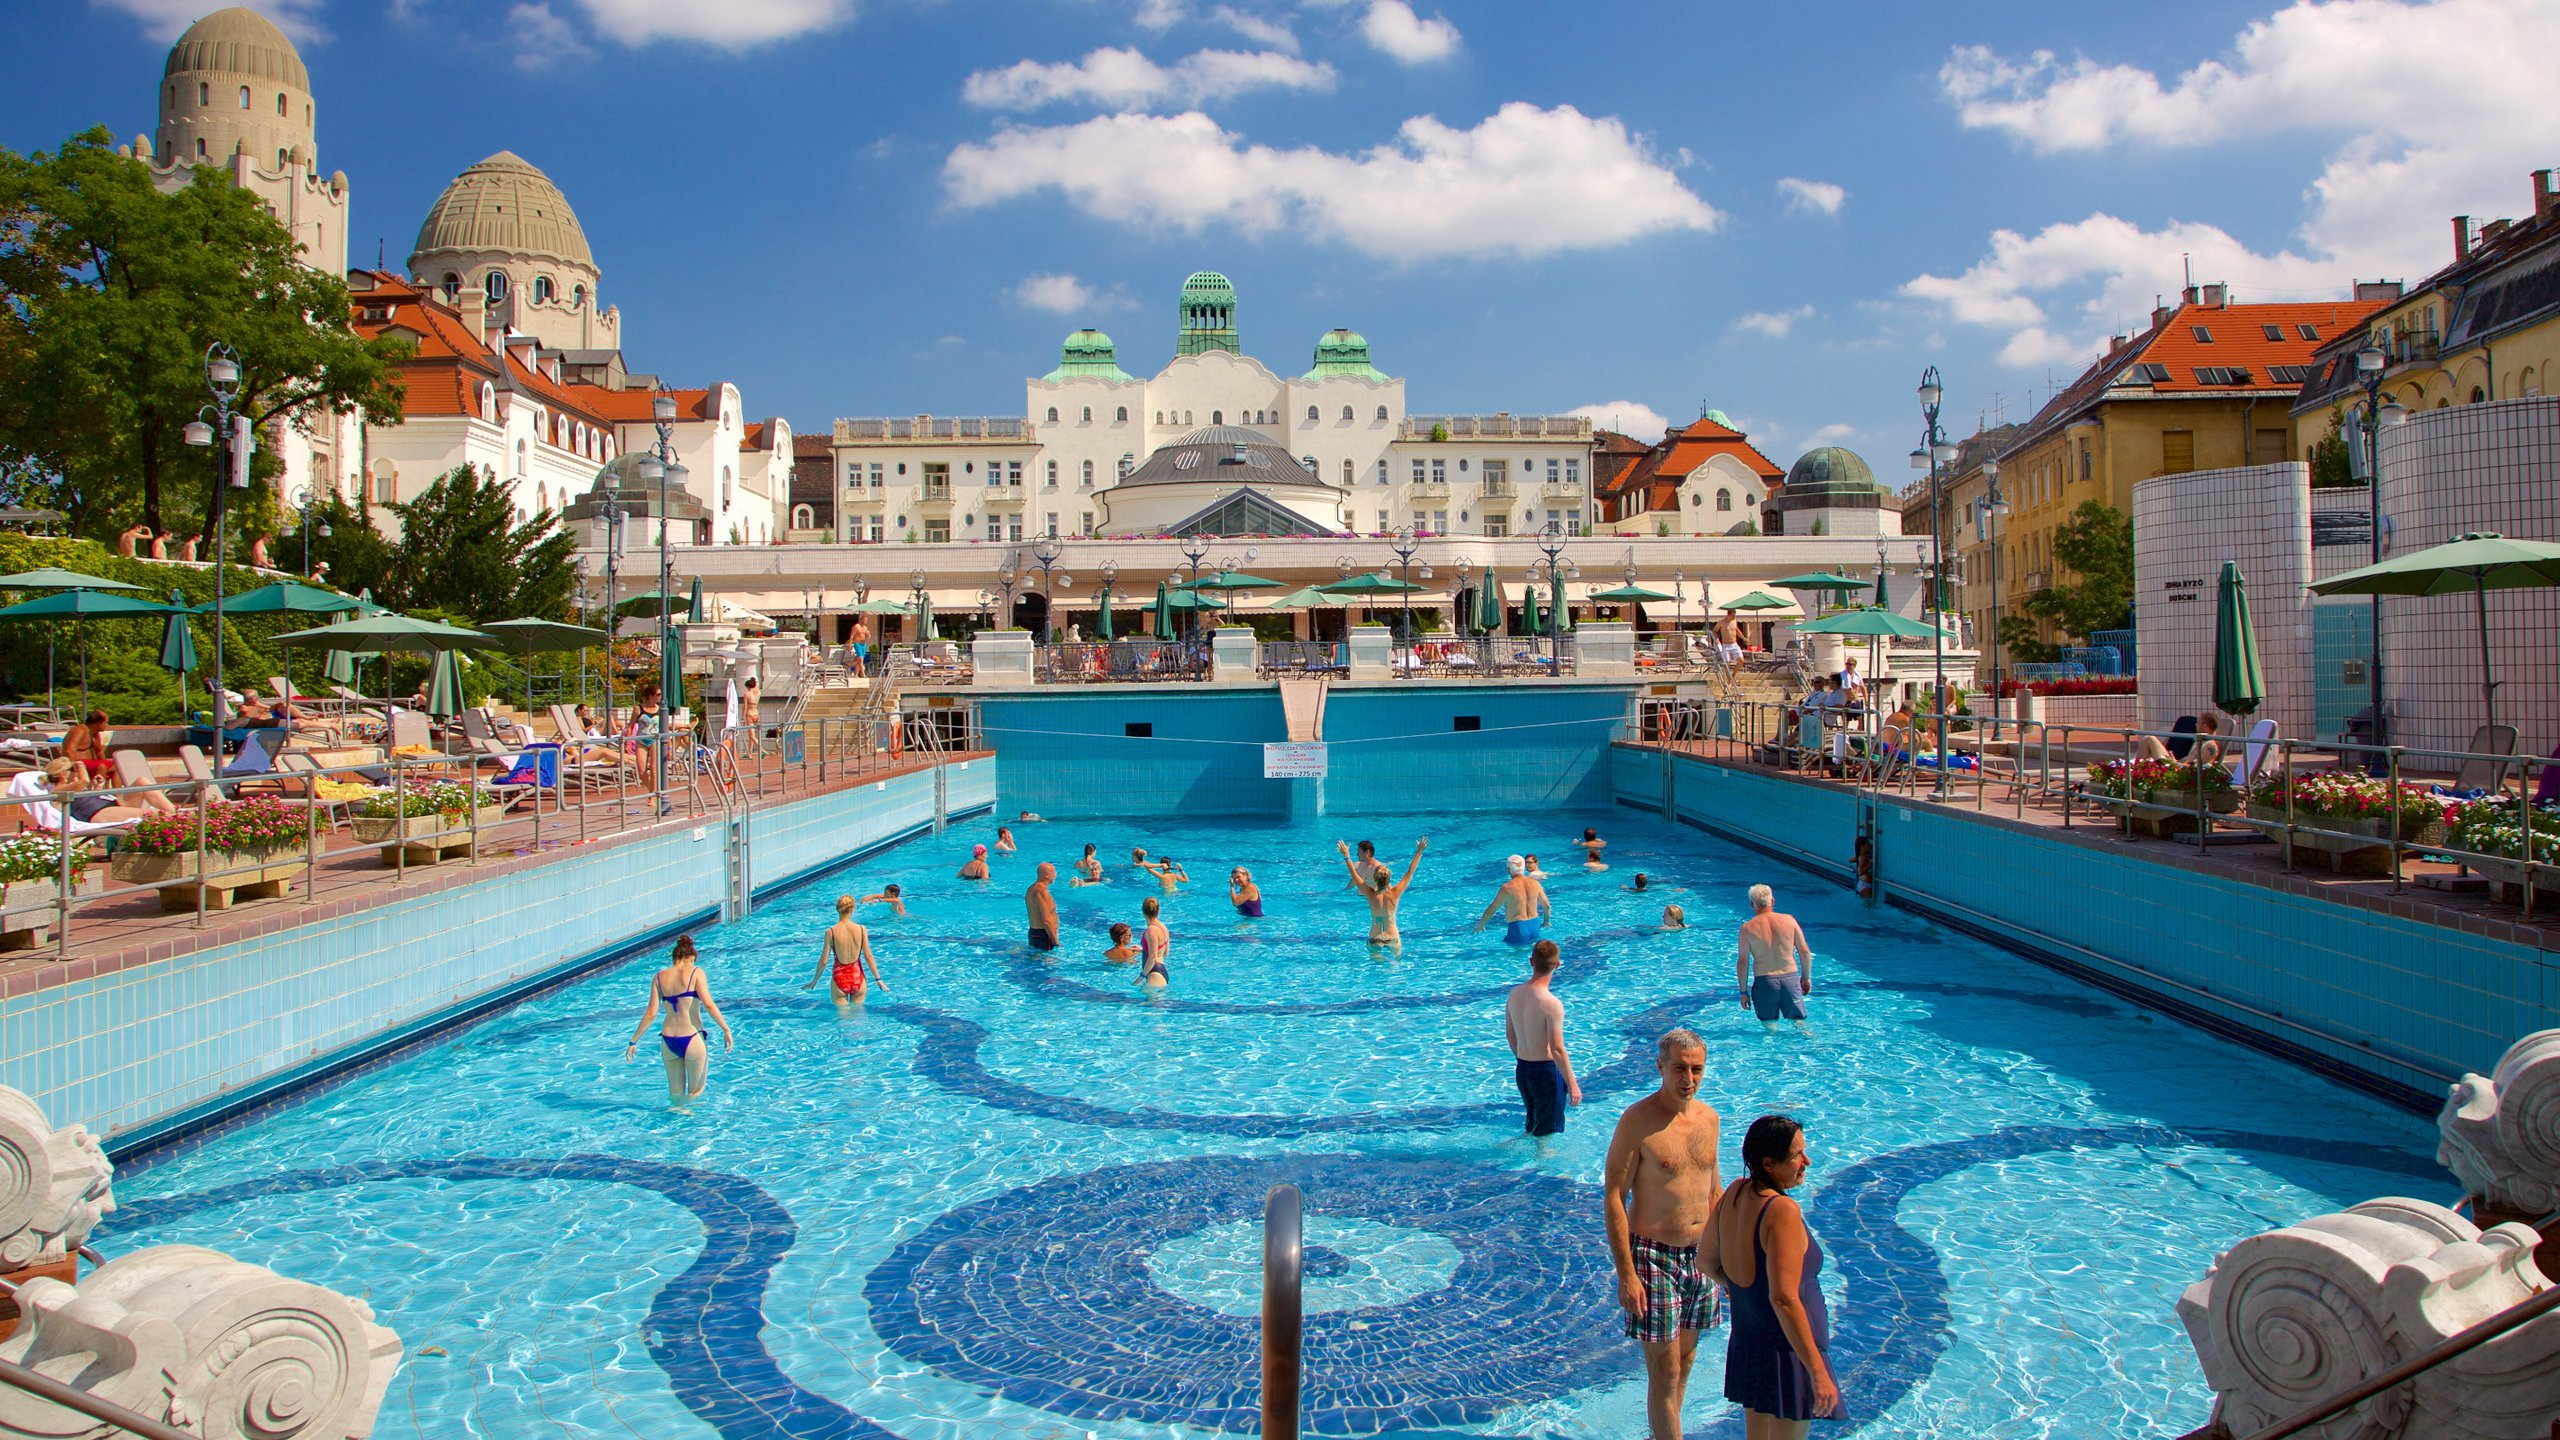 Karta Over Budapest Sevardheter.Hotell Budapest Boka Billiga Hotell I Budapest Expedia Se